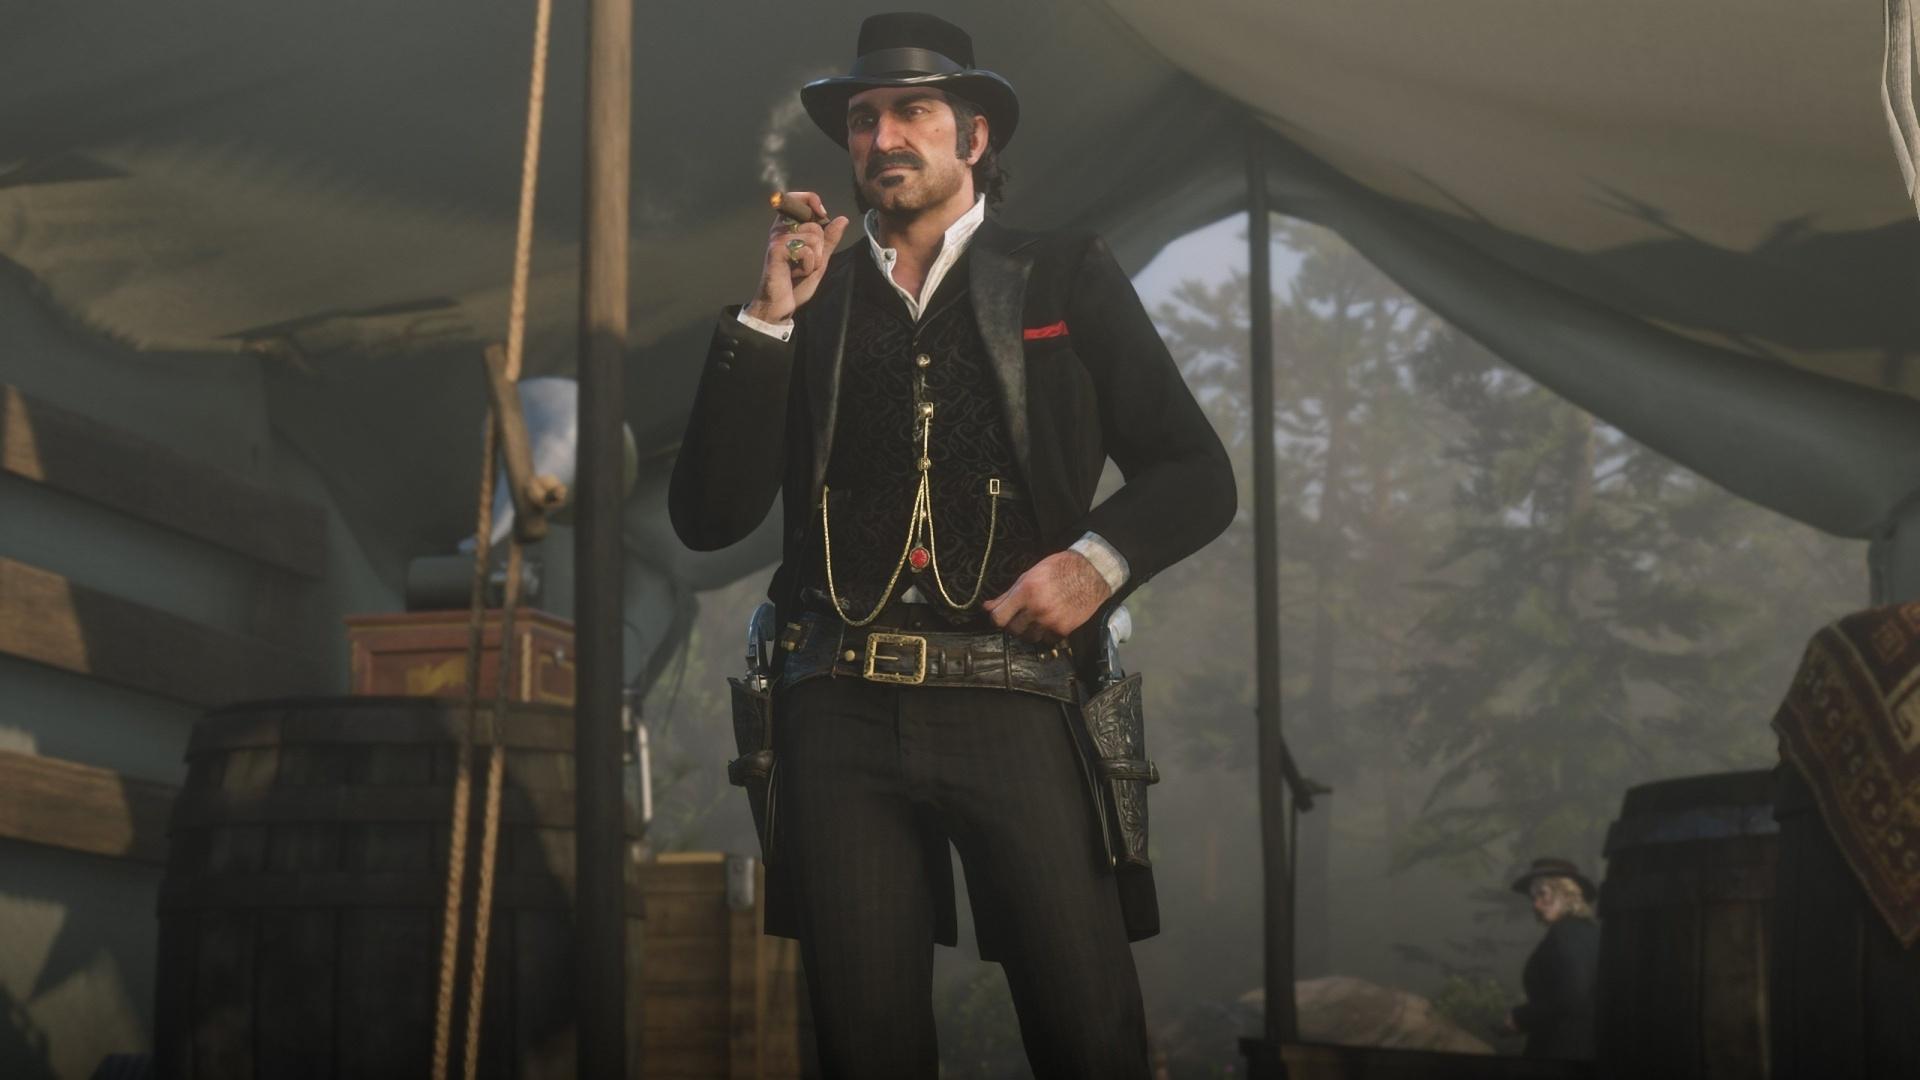 Rockstar публично извинилась за проблемы Red Dead Redemption2 на PC